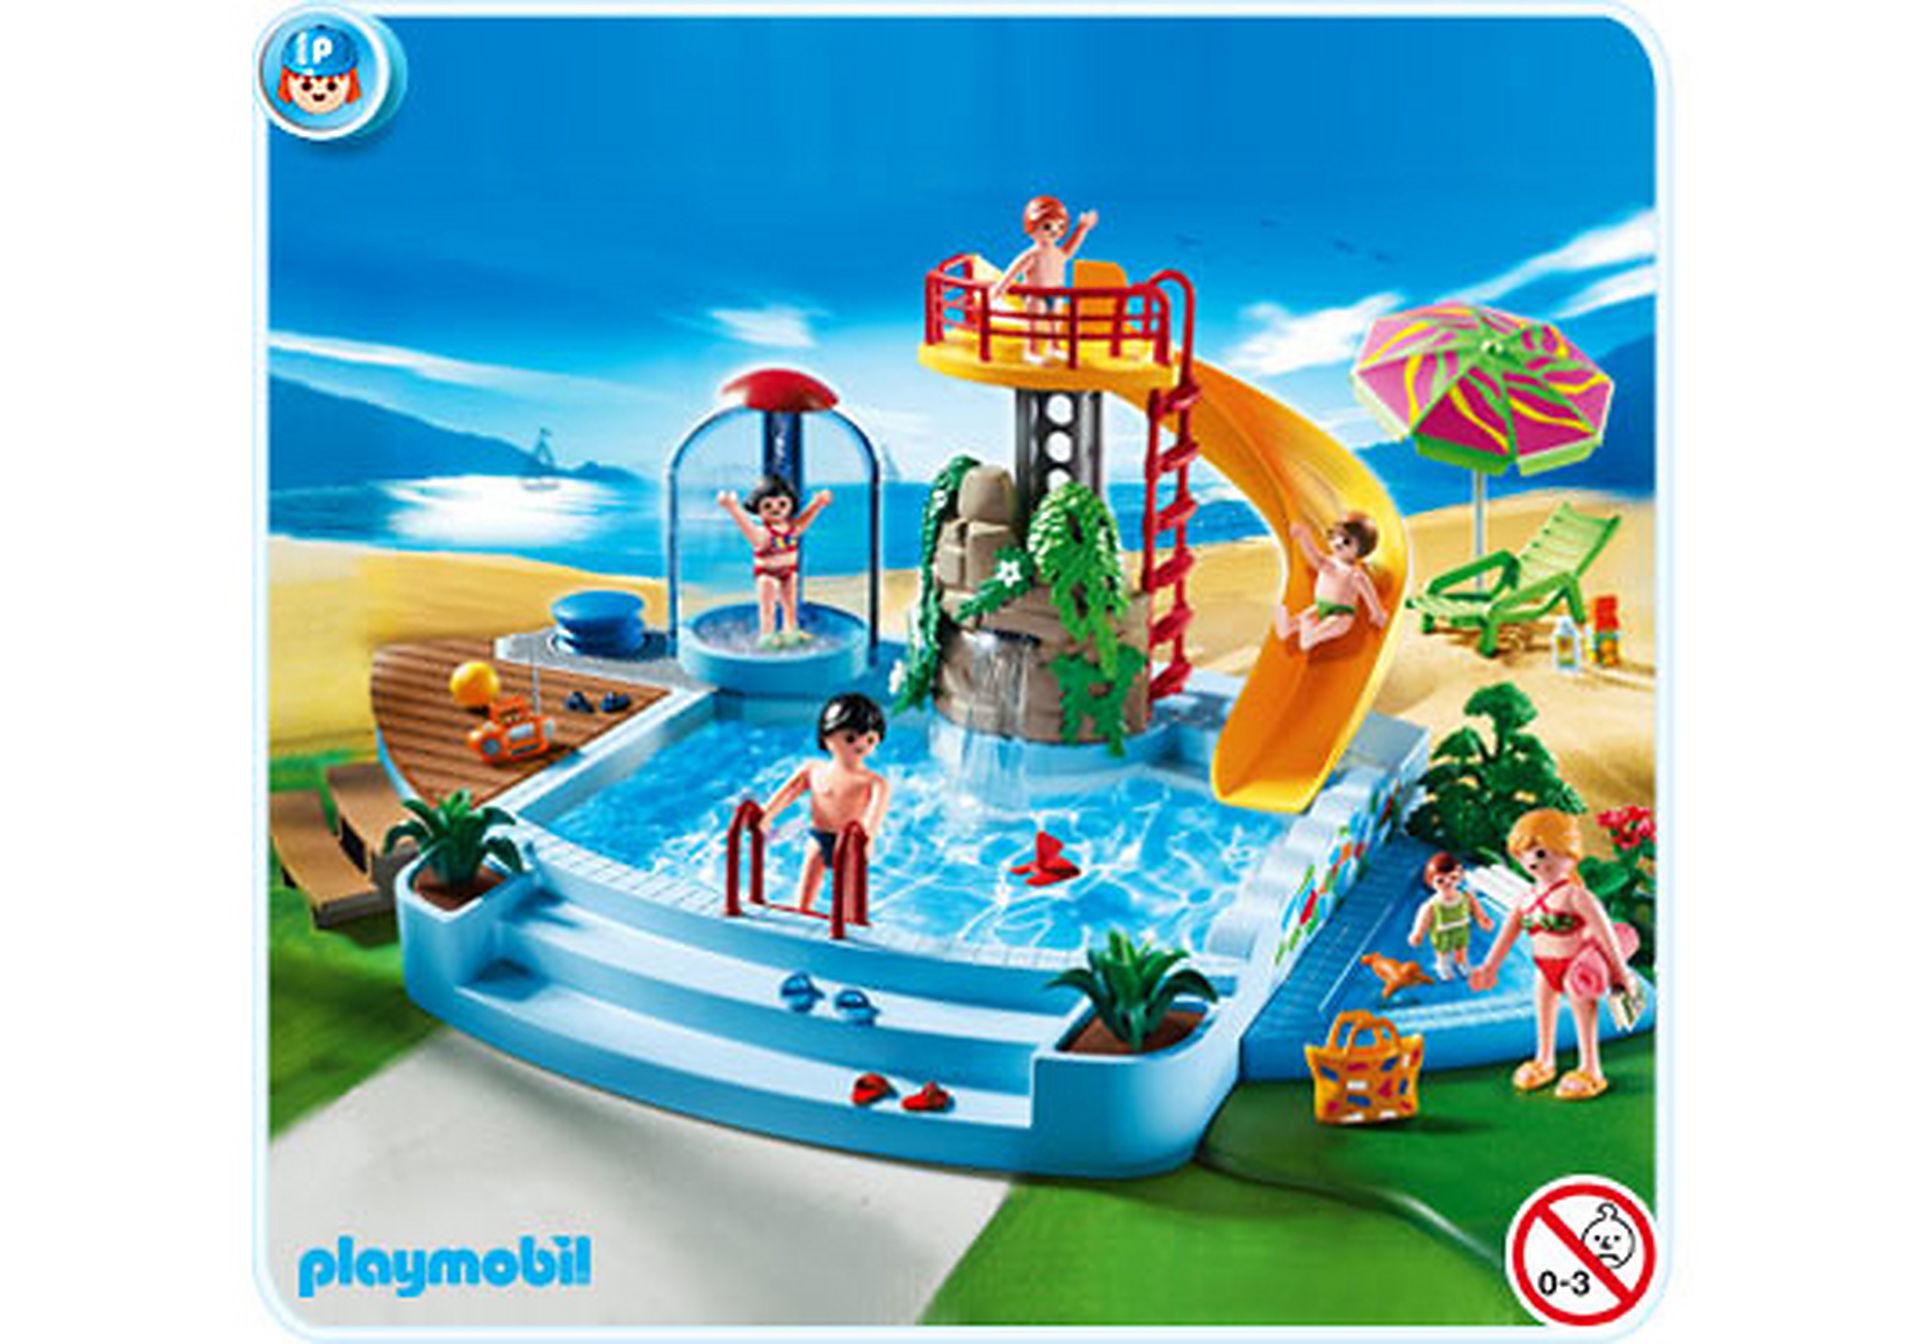 http://media.playmobil.com/i/playmobil/4858-A_product_detail/Piscine avec toboggan